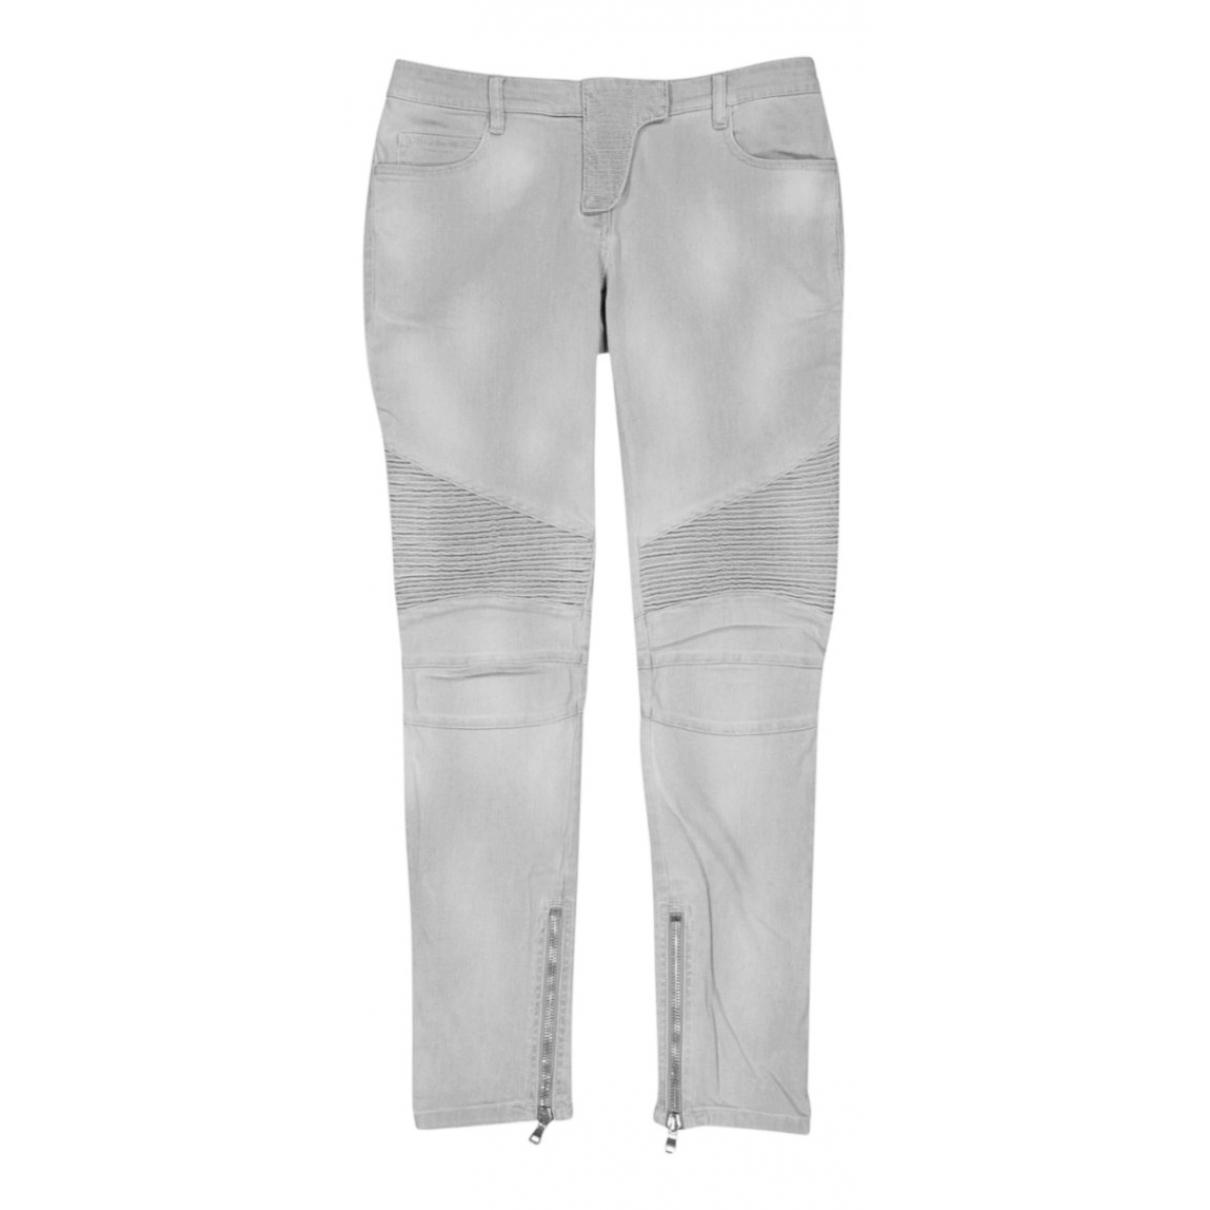 Balmain \N Grey Cotton - elasthane Jeans for Women 25 US